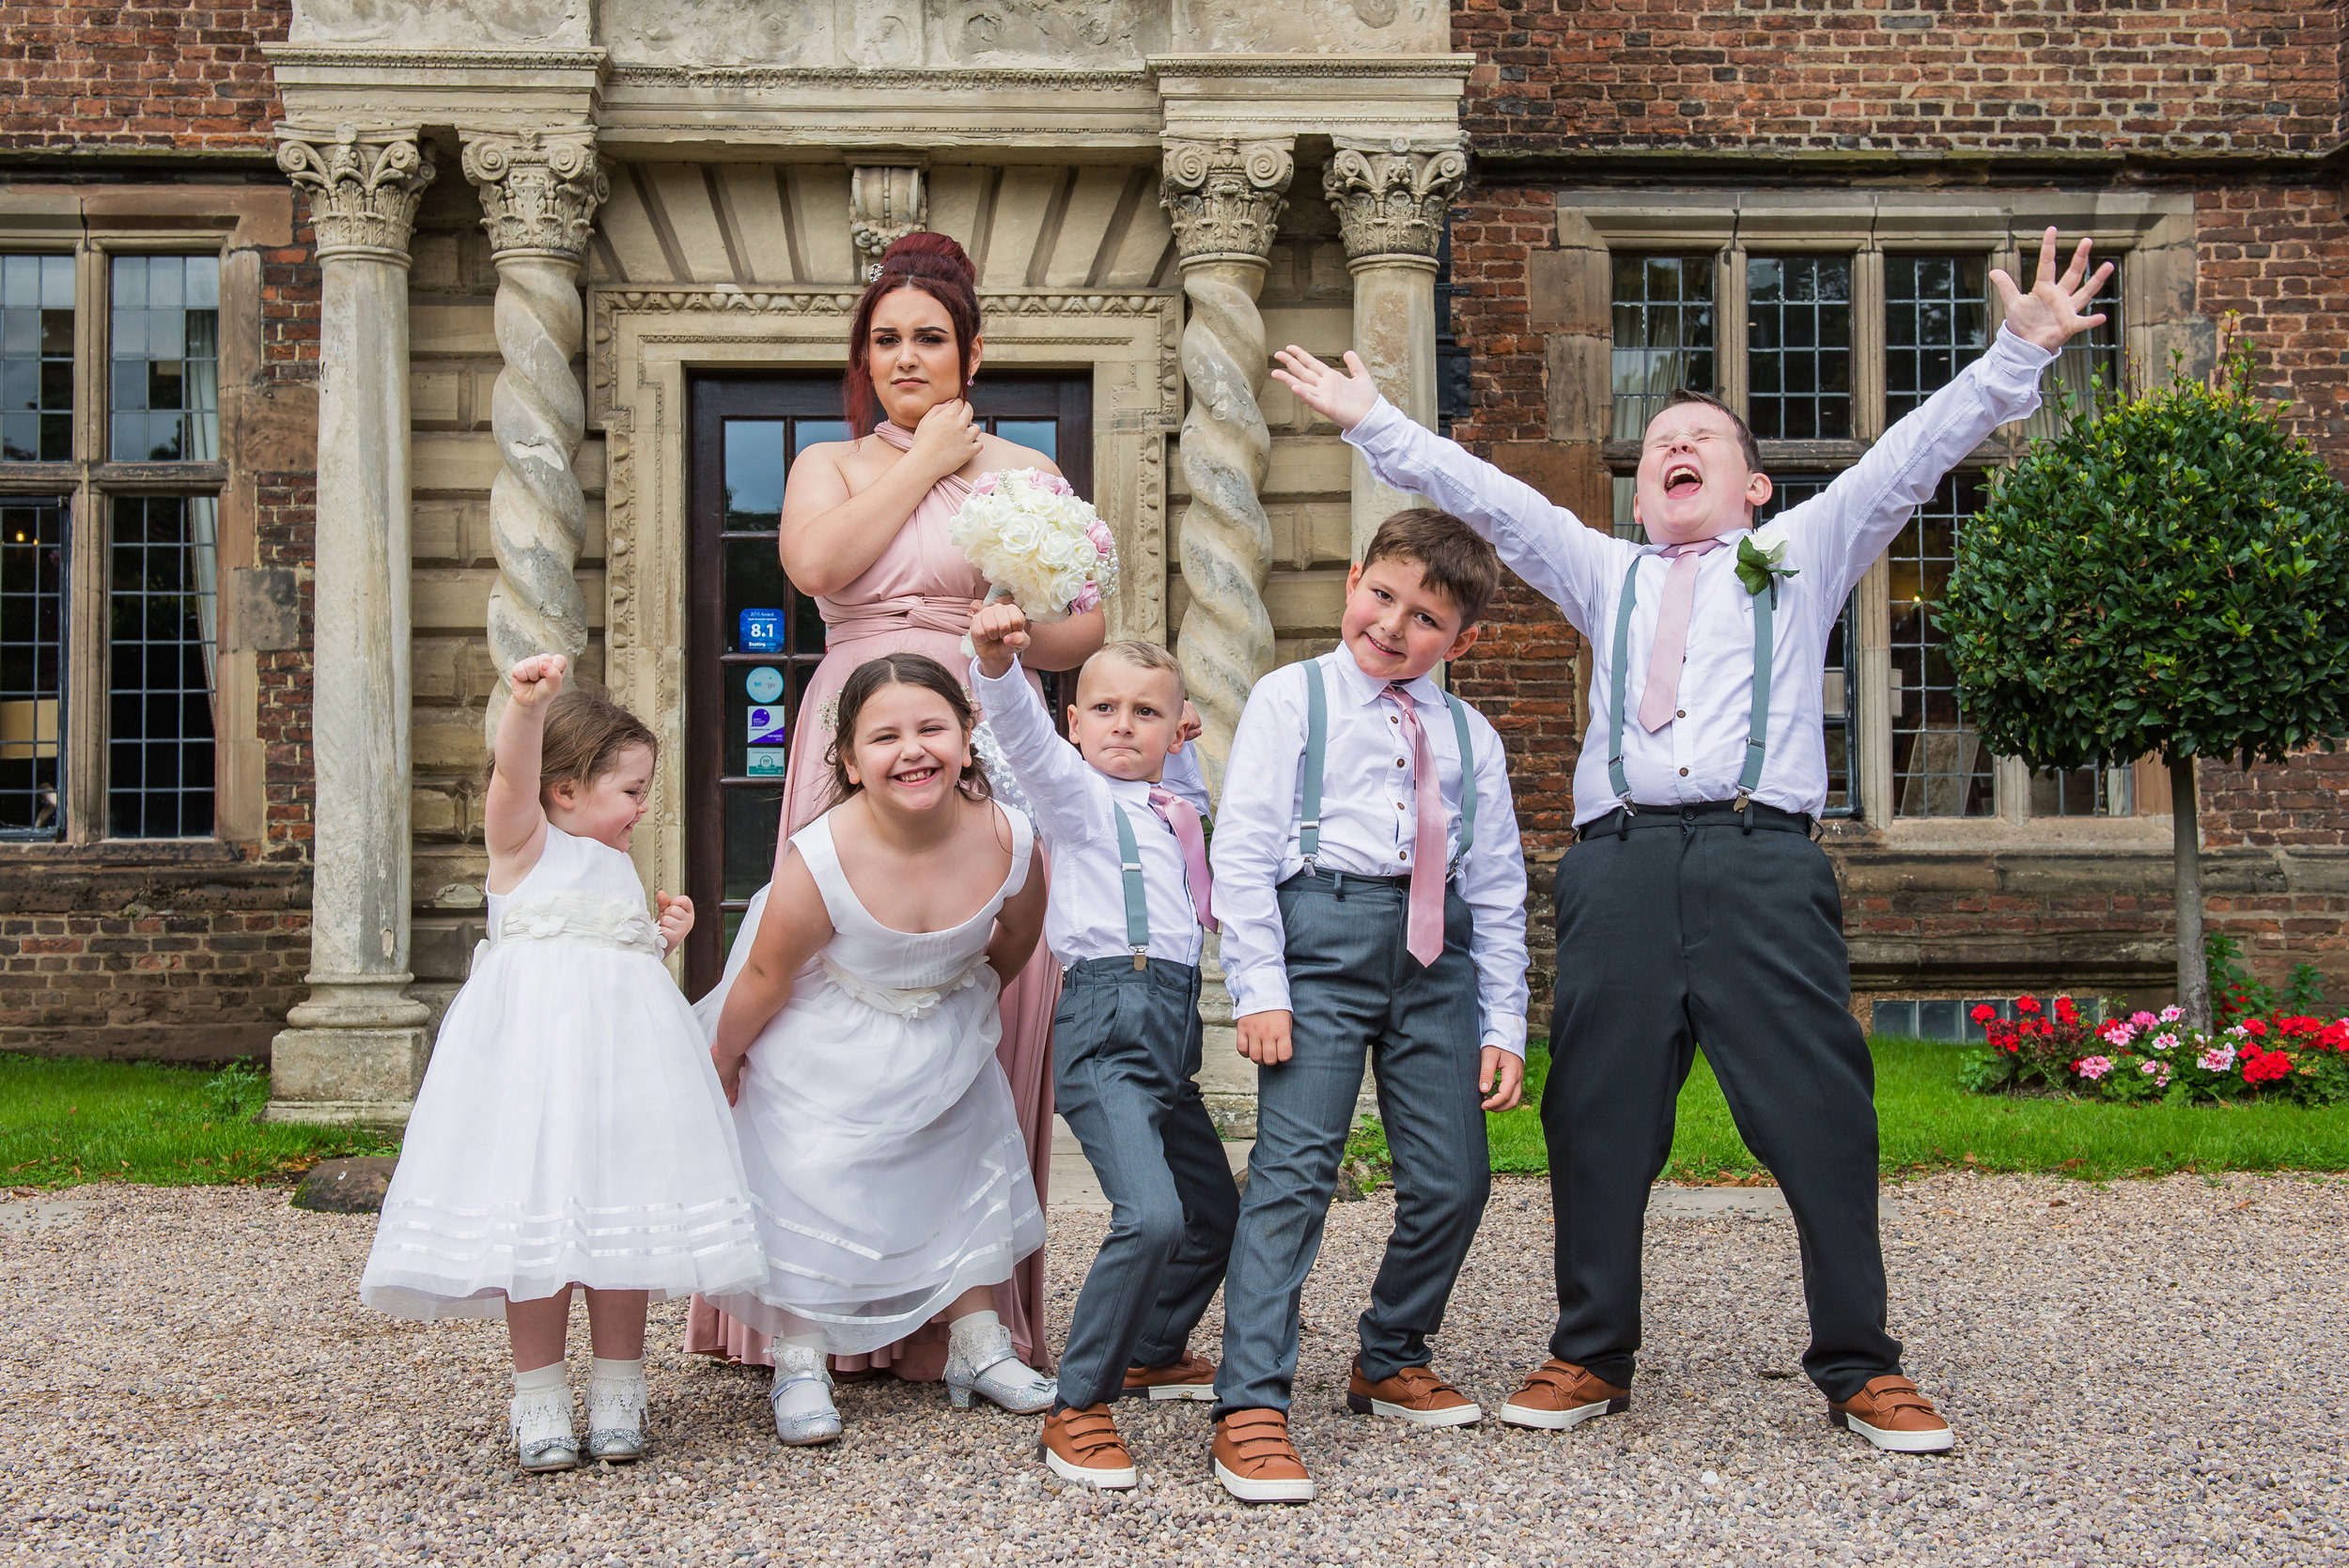 castle Bromwich hall hotel wedding photography fun kids photos